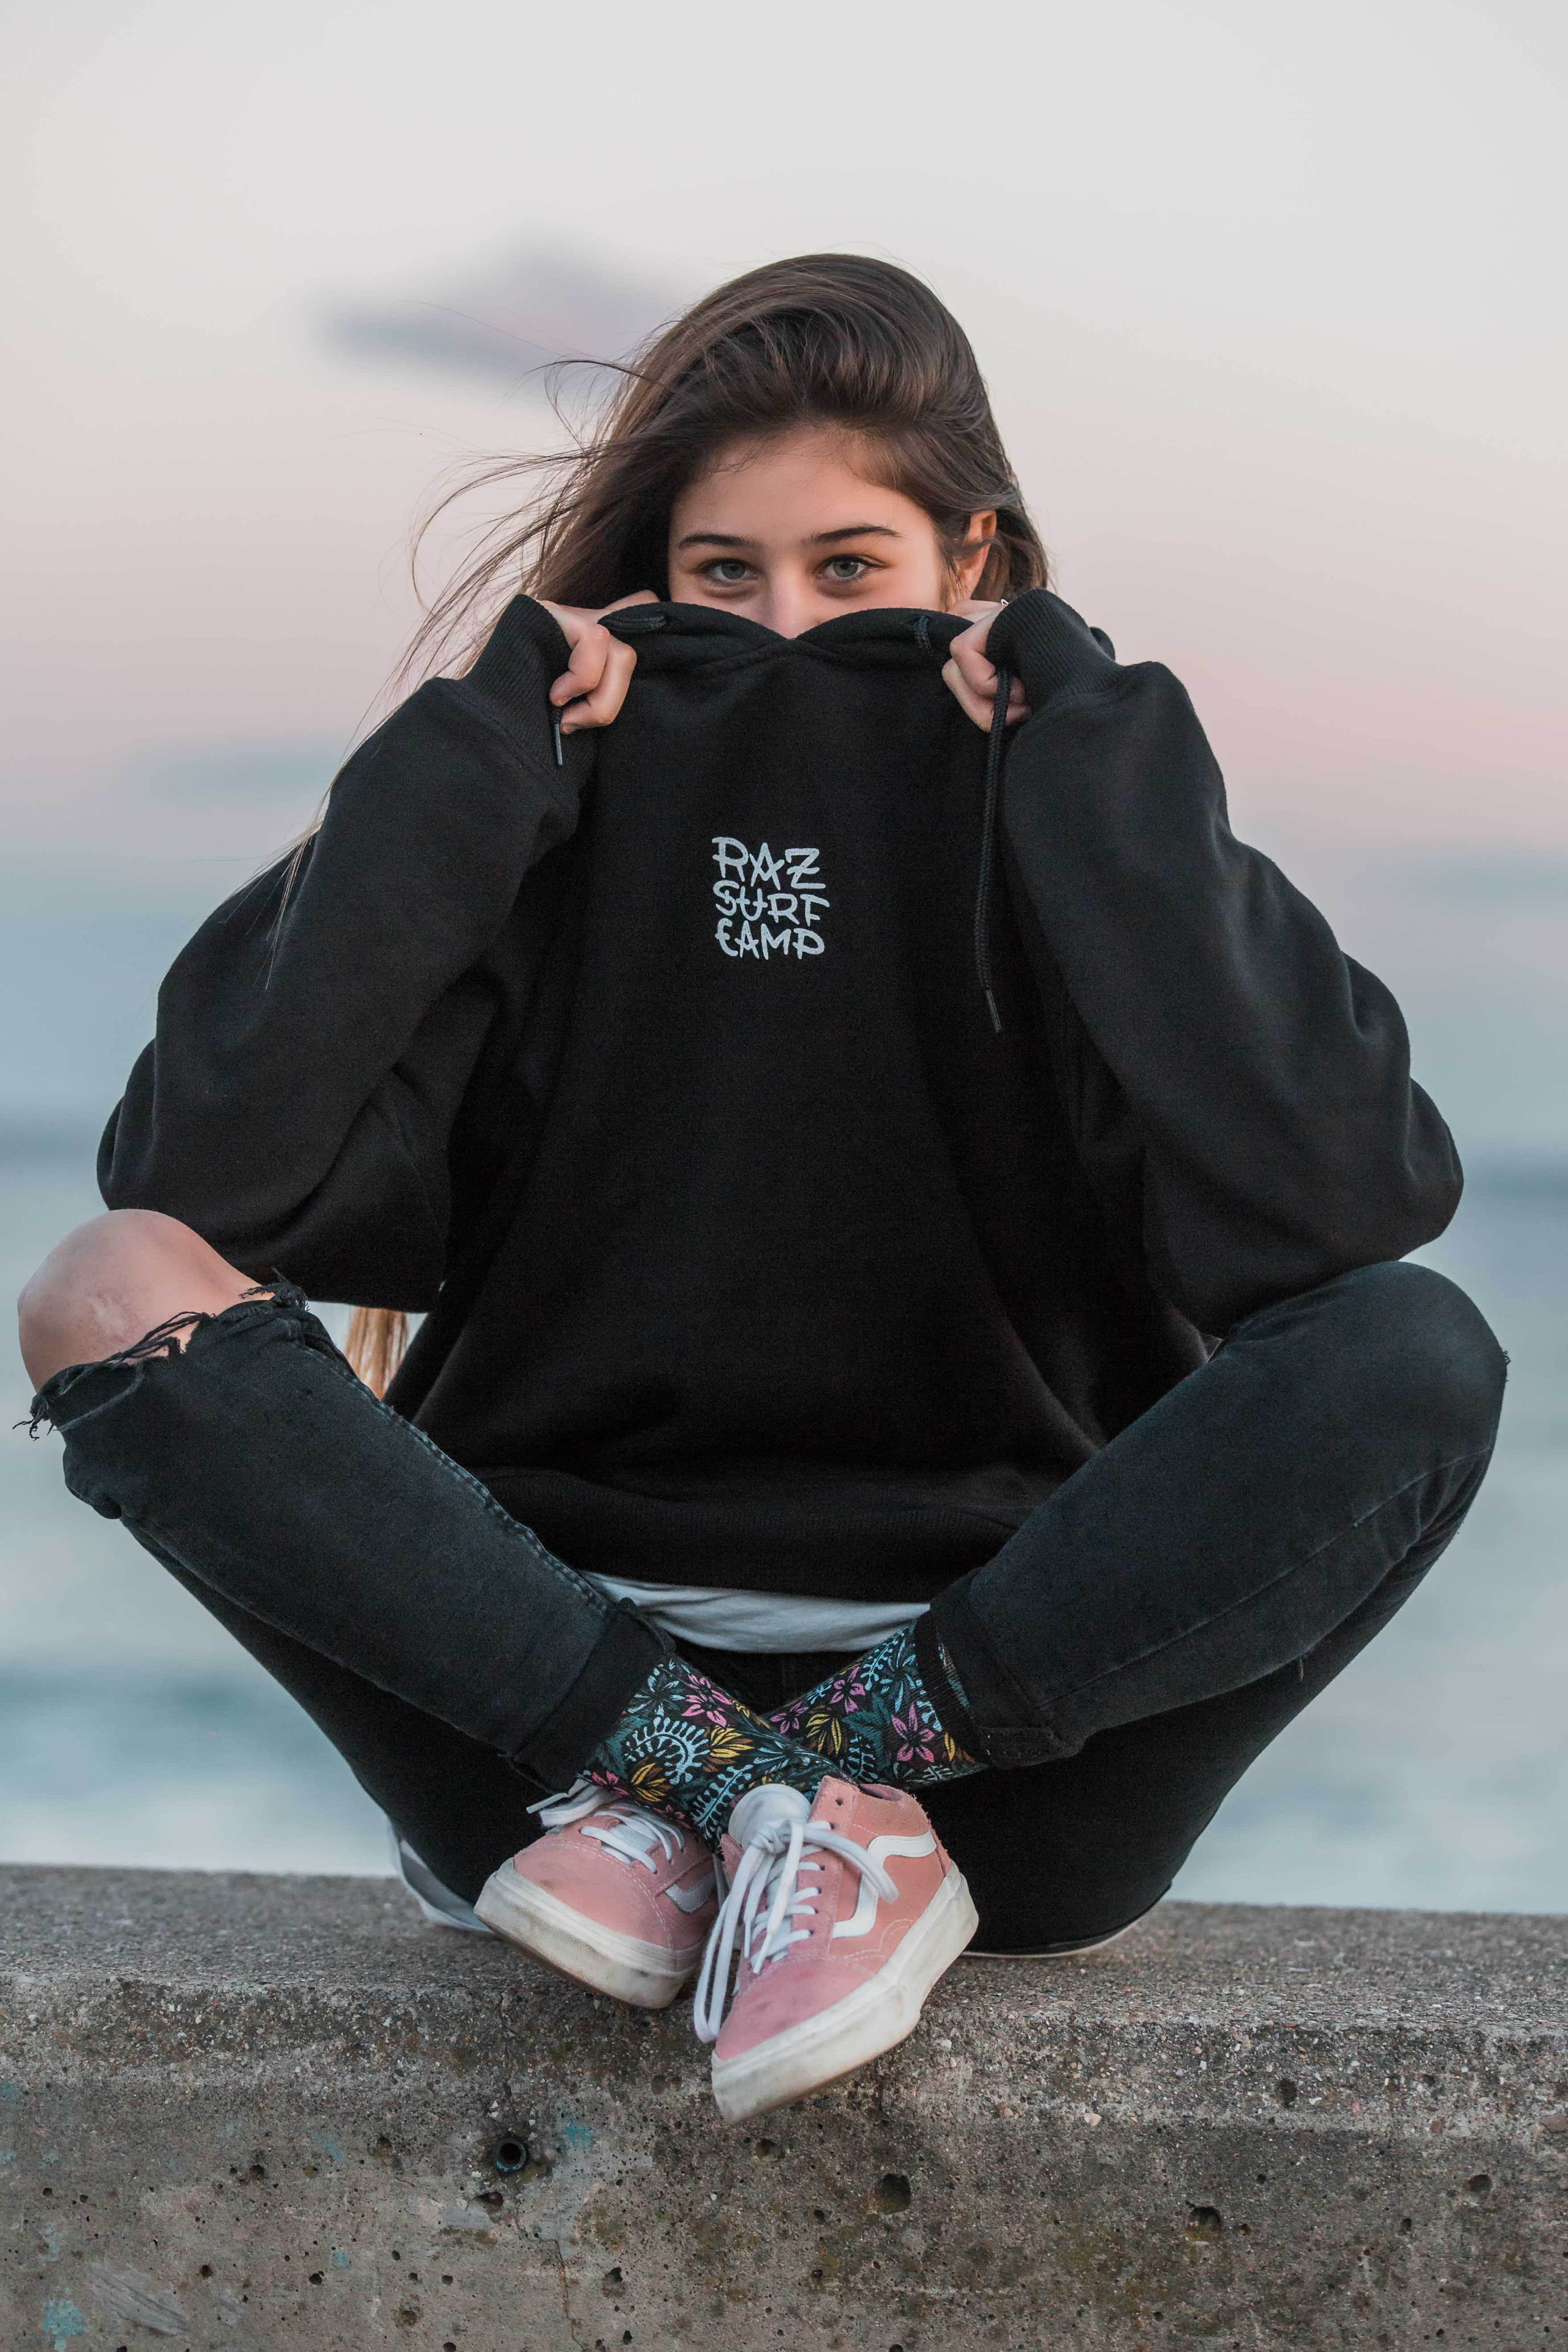 moda surfera streetwear surfing clothing raz surfcamp razo praia playa badalona